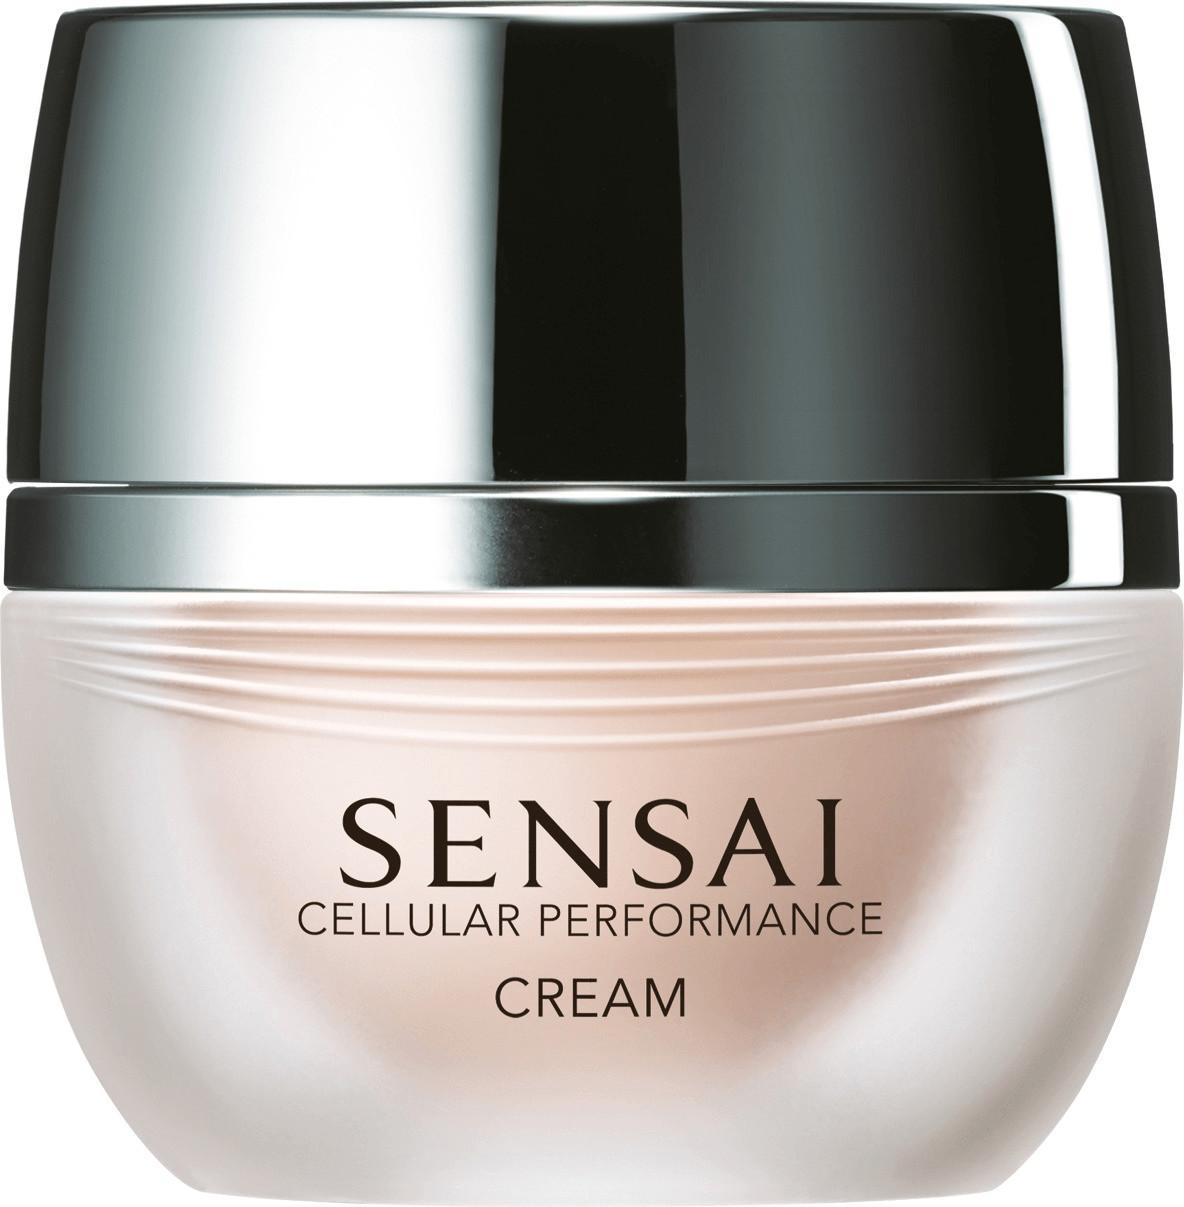 Kanebo Sensai Cellular Performance Cream (40ml)